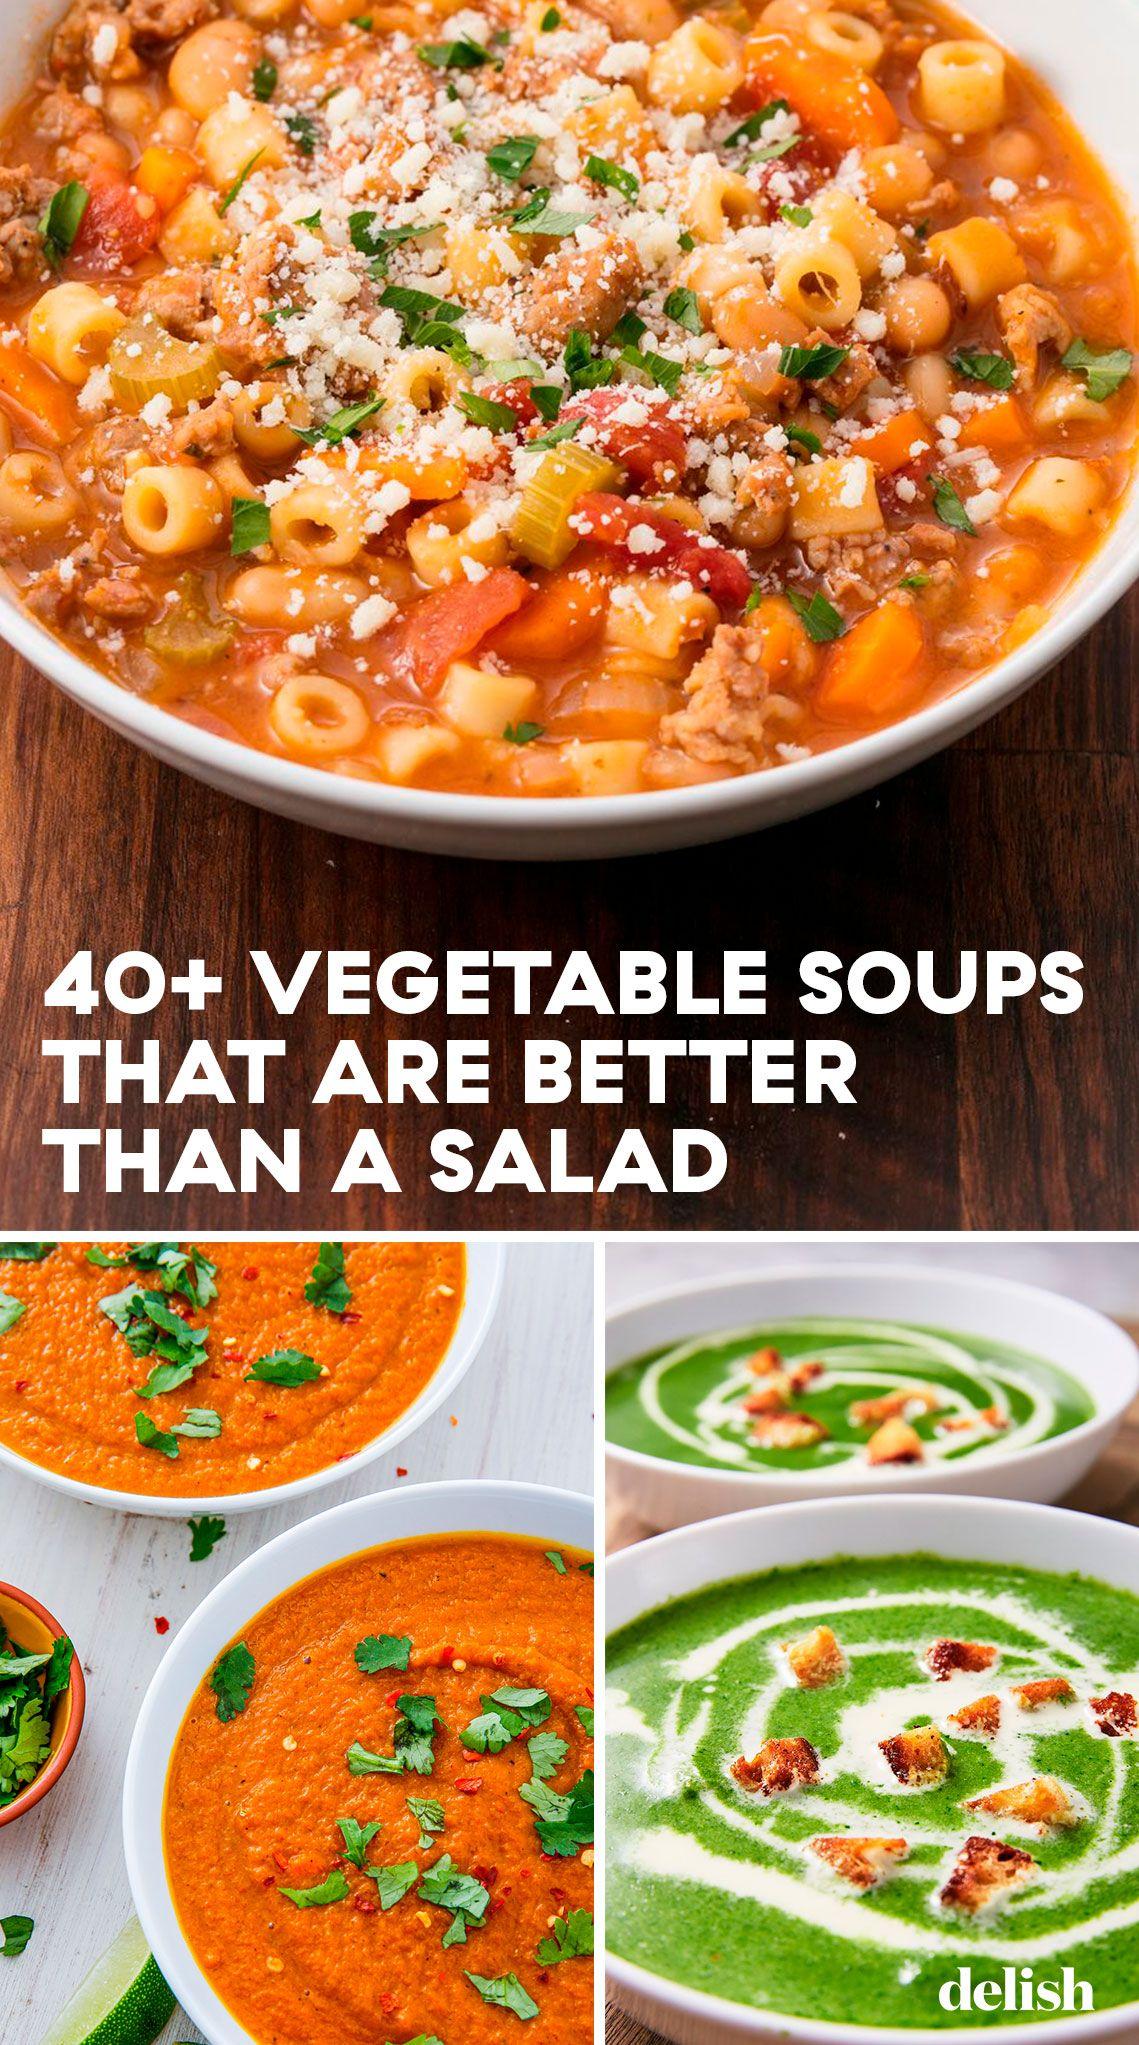 42 Vegetable Soups Better Than A Salad Recipes Delicious Soup Vegetarian Recipes